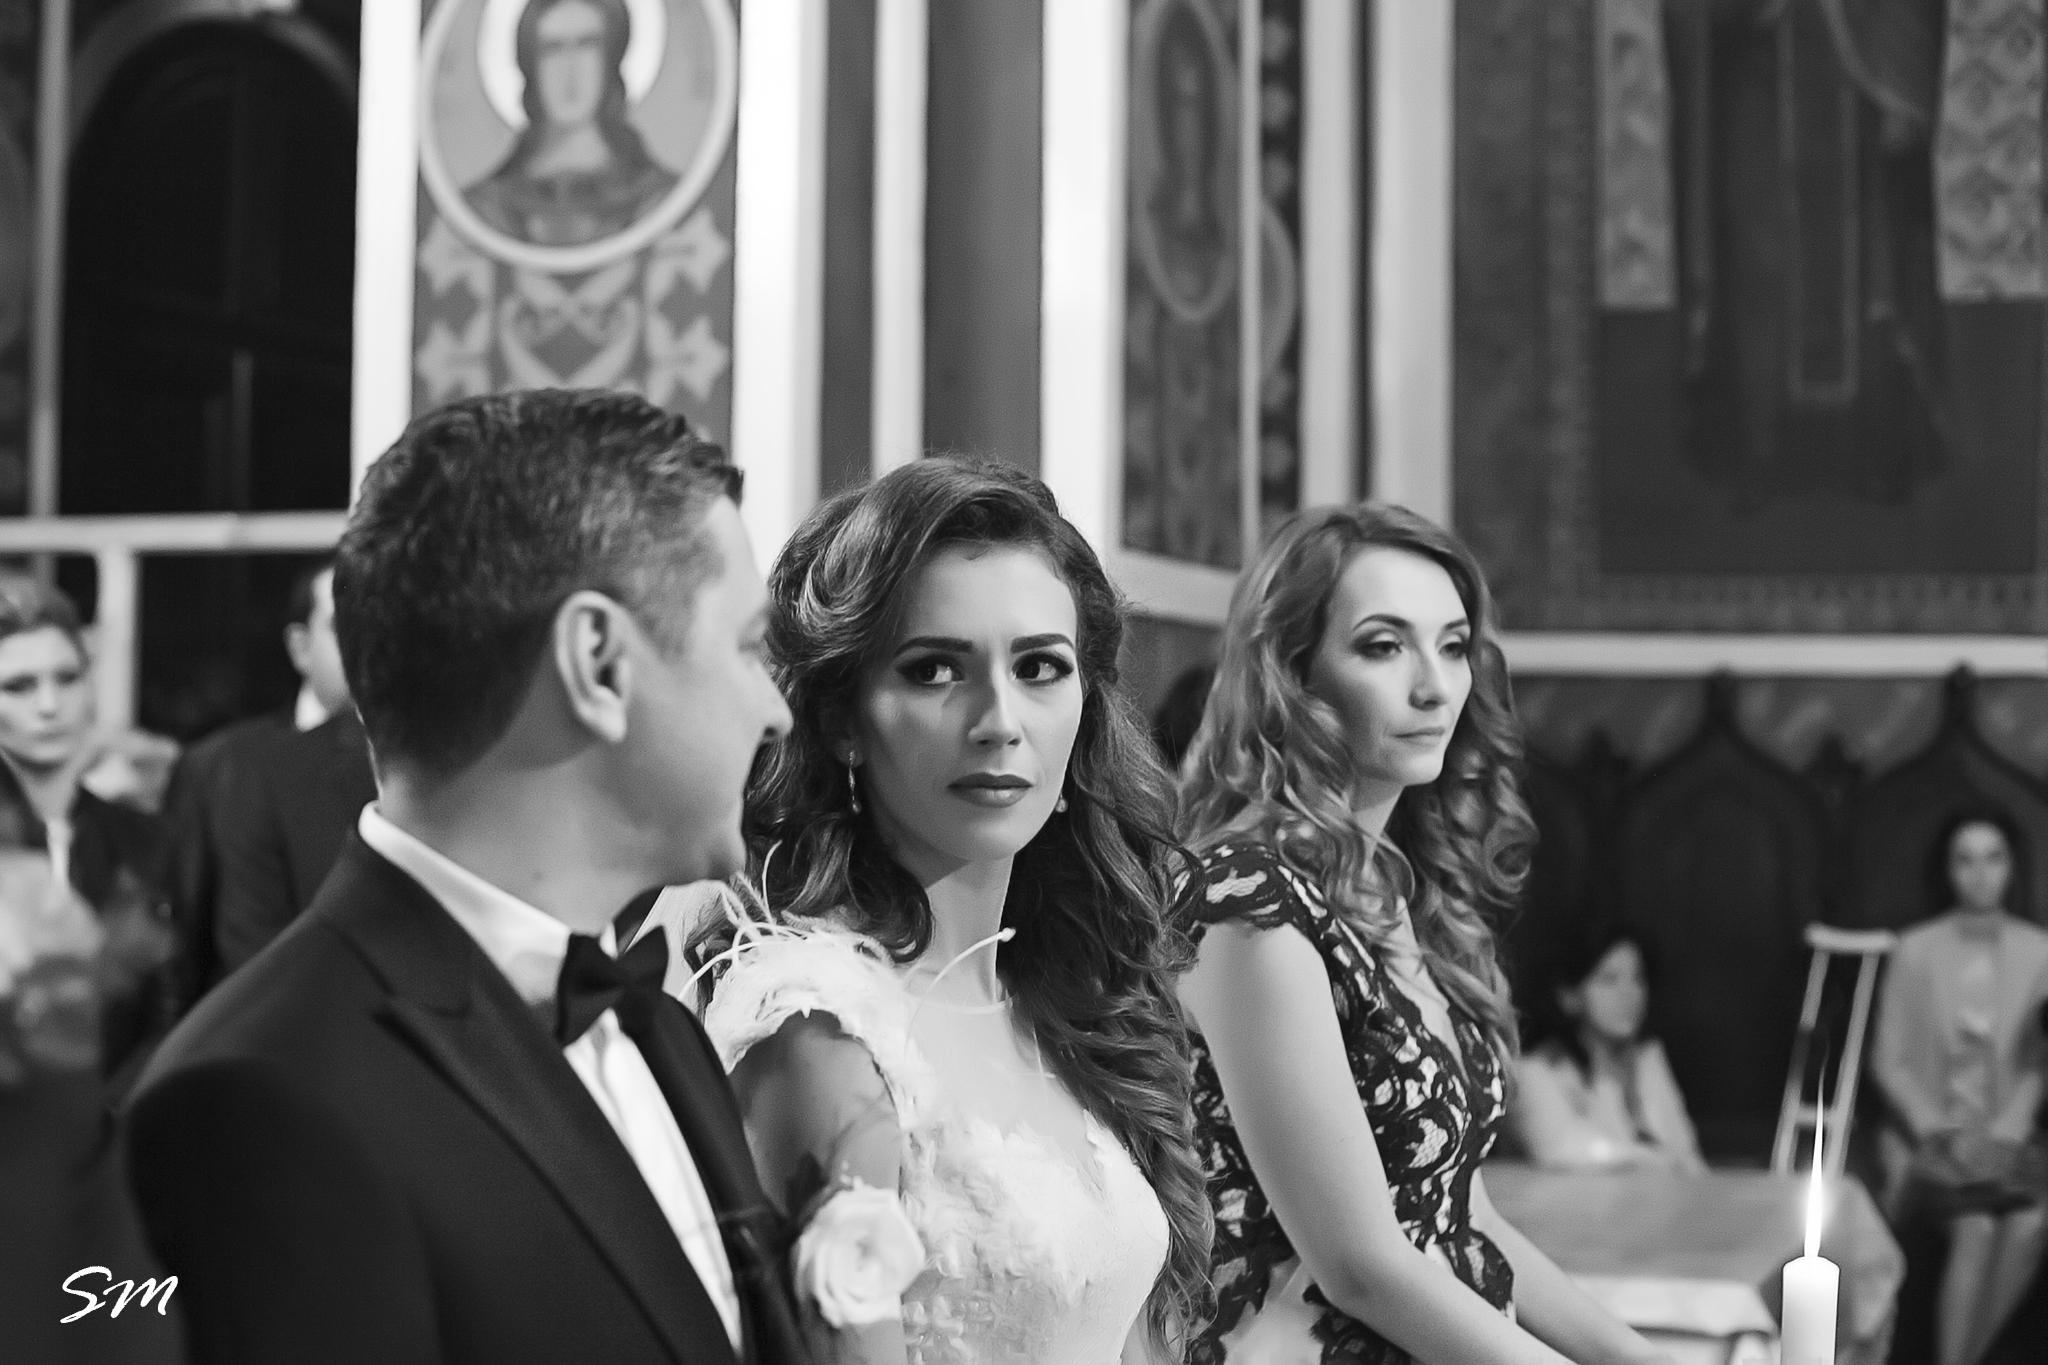 fotograf_nunta_profesionist_suceava (19)